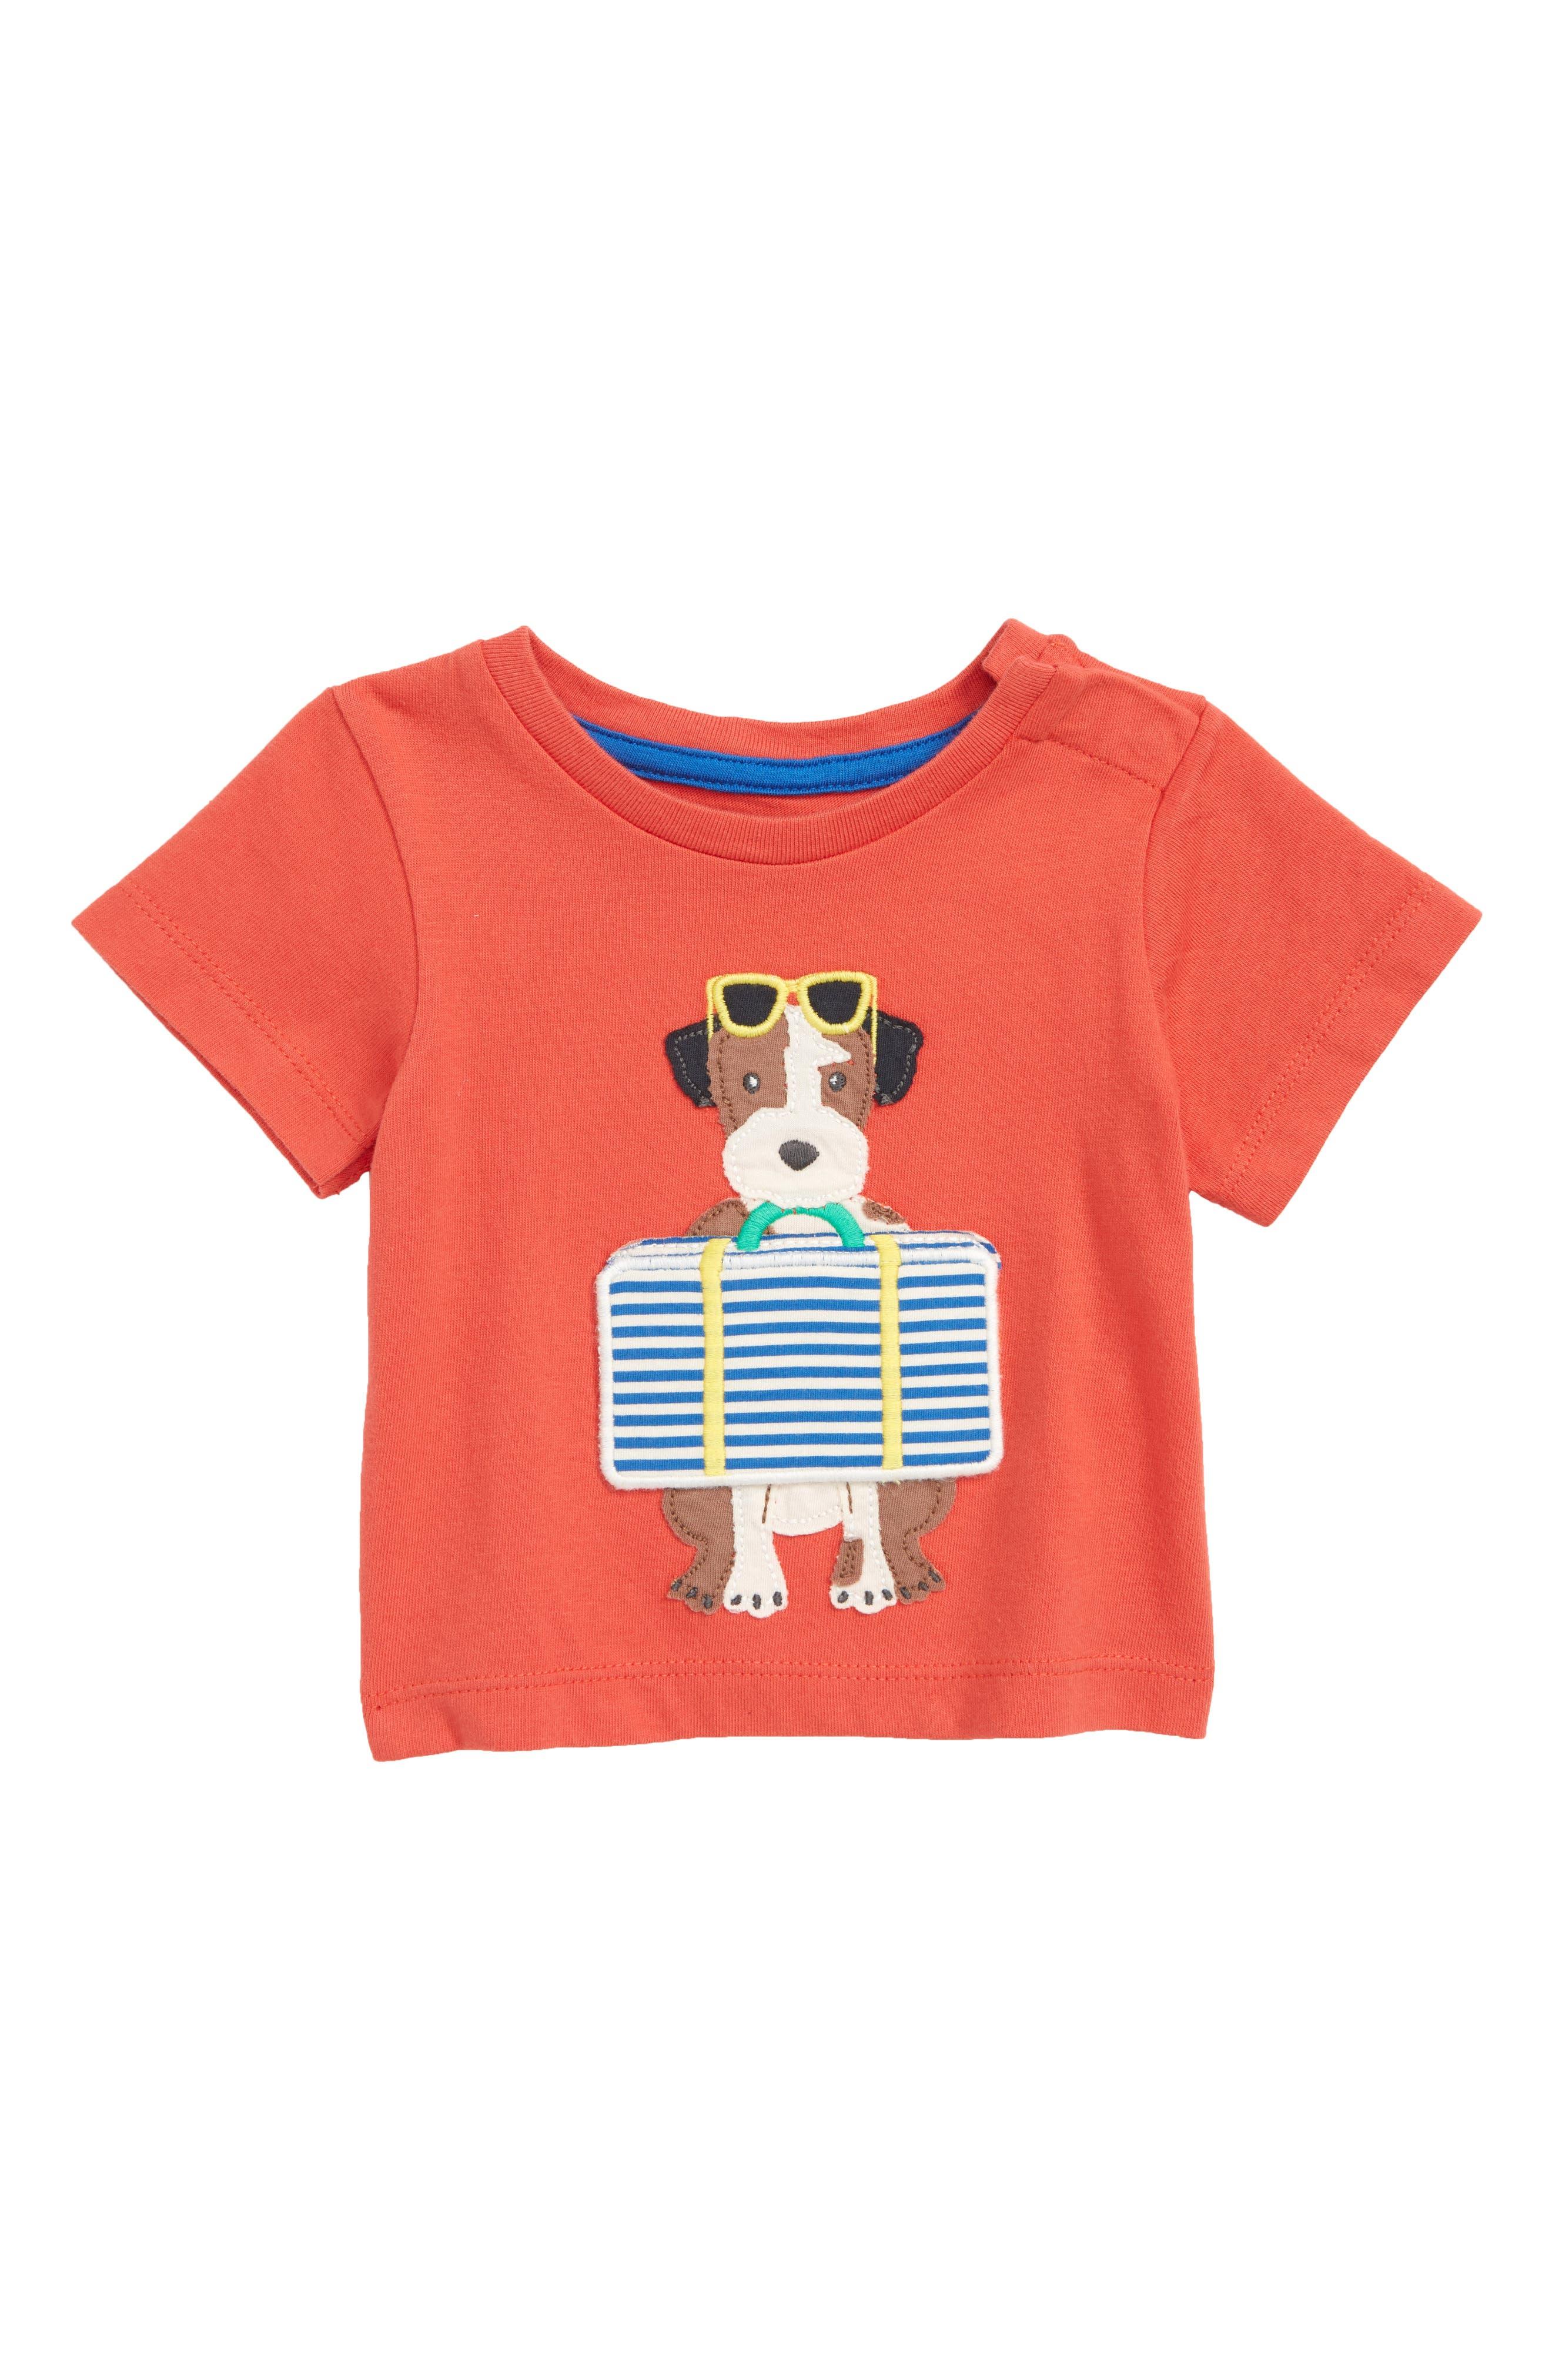 MINI BODEN Peekaboo T-Shirt, Main, color, 614